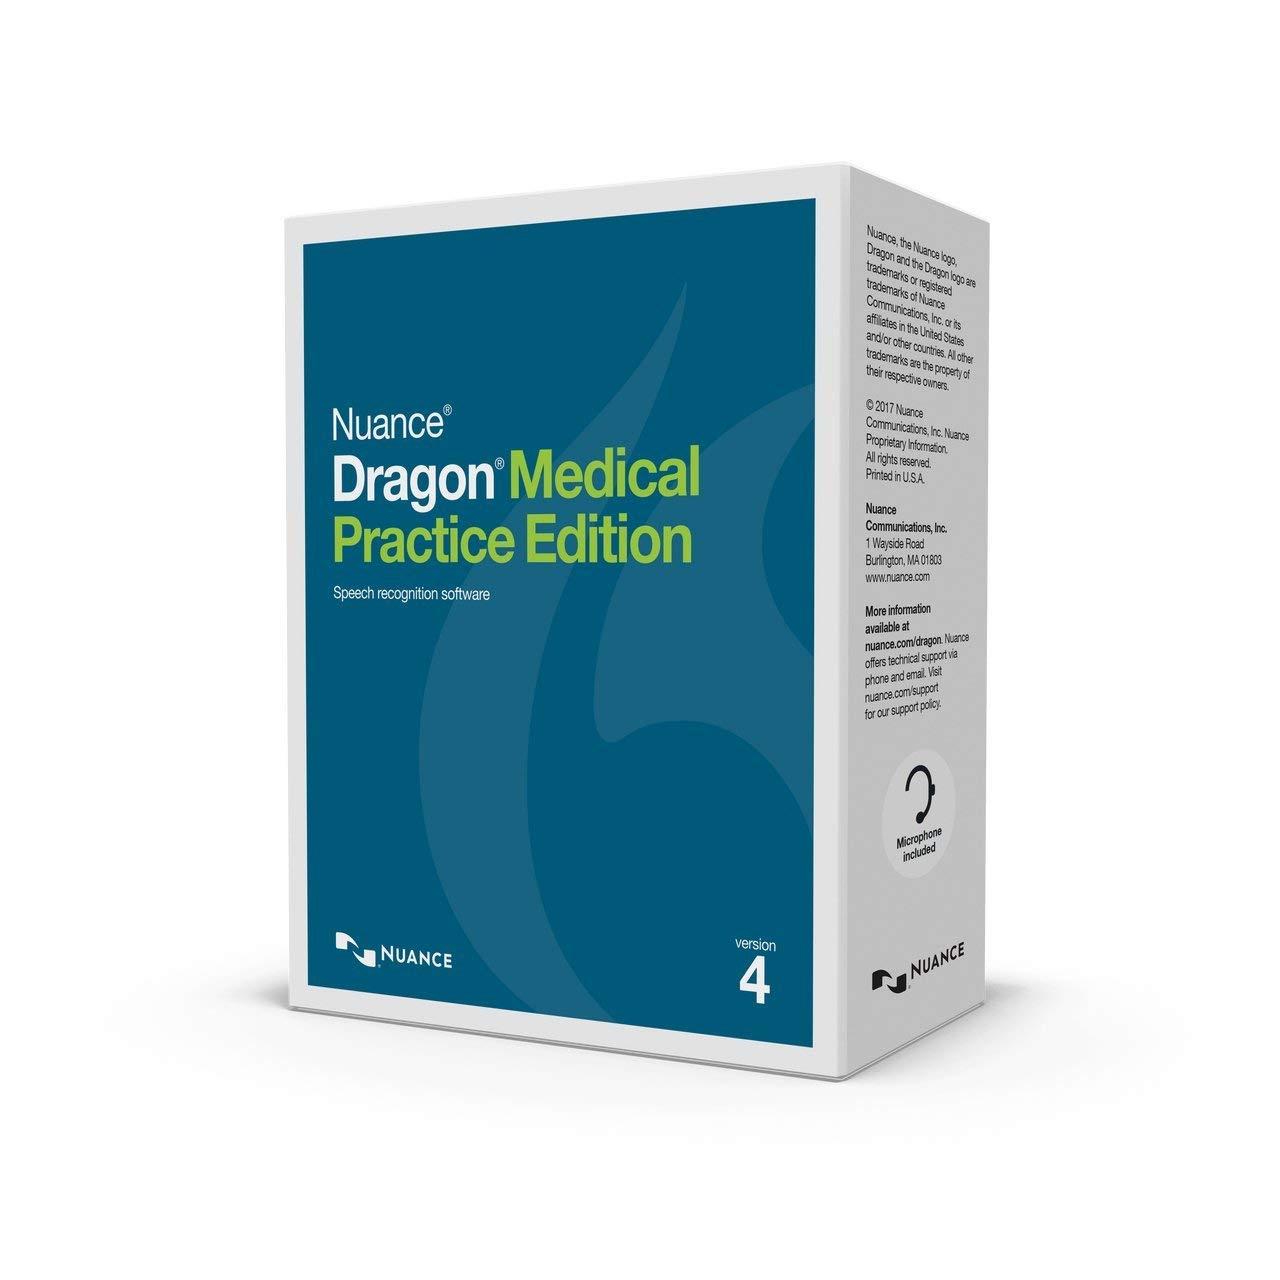 NUA-SN-A709A-X00-4.0 DRAGON MEDICAL PRACTICE EDITION 4 **NON-PHYSICAL PRODUCT**